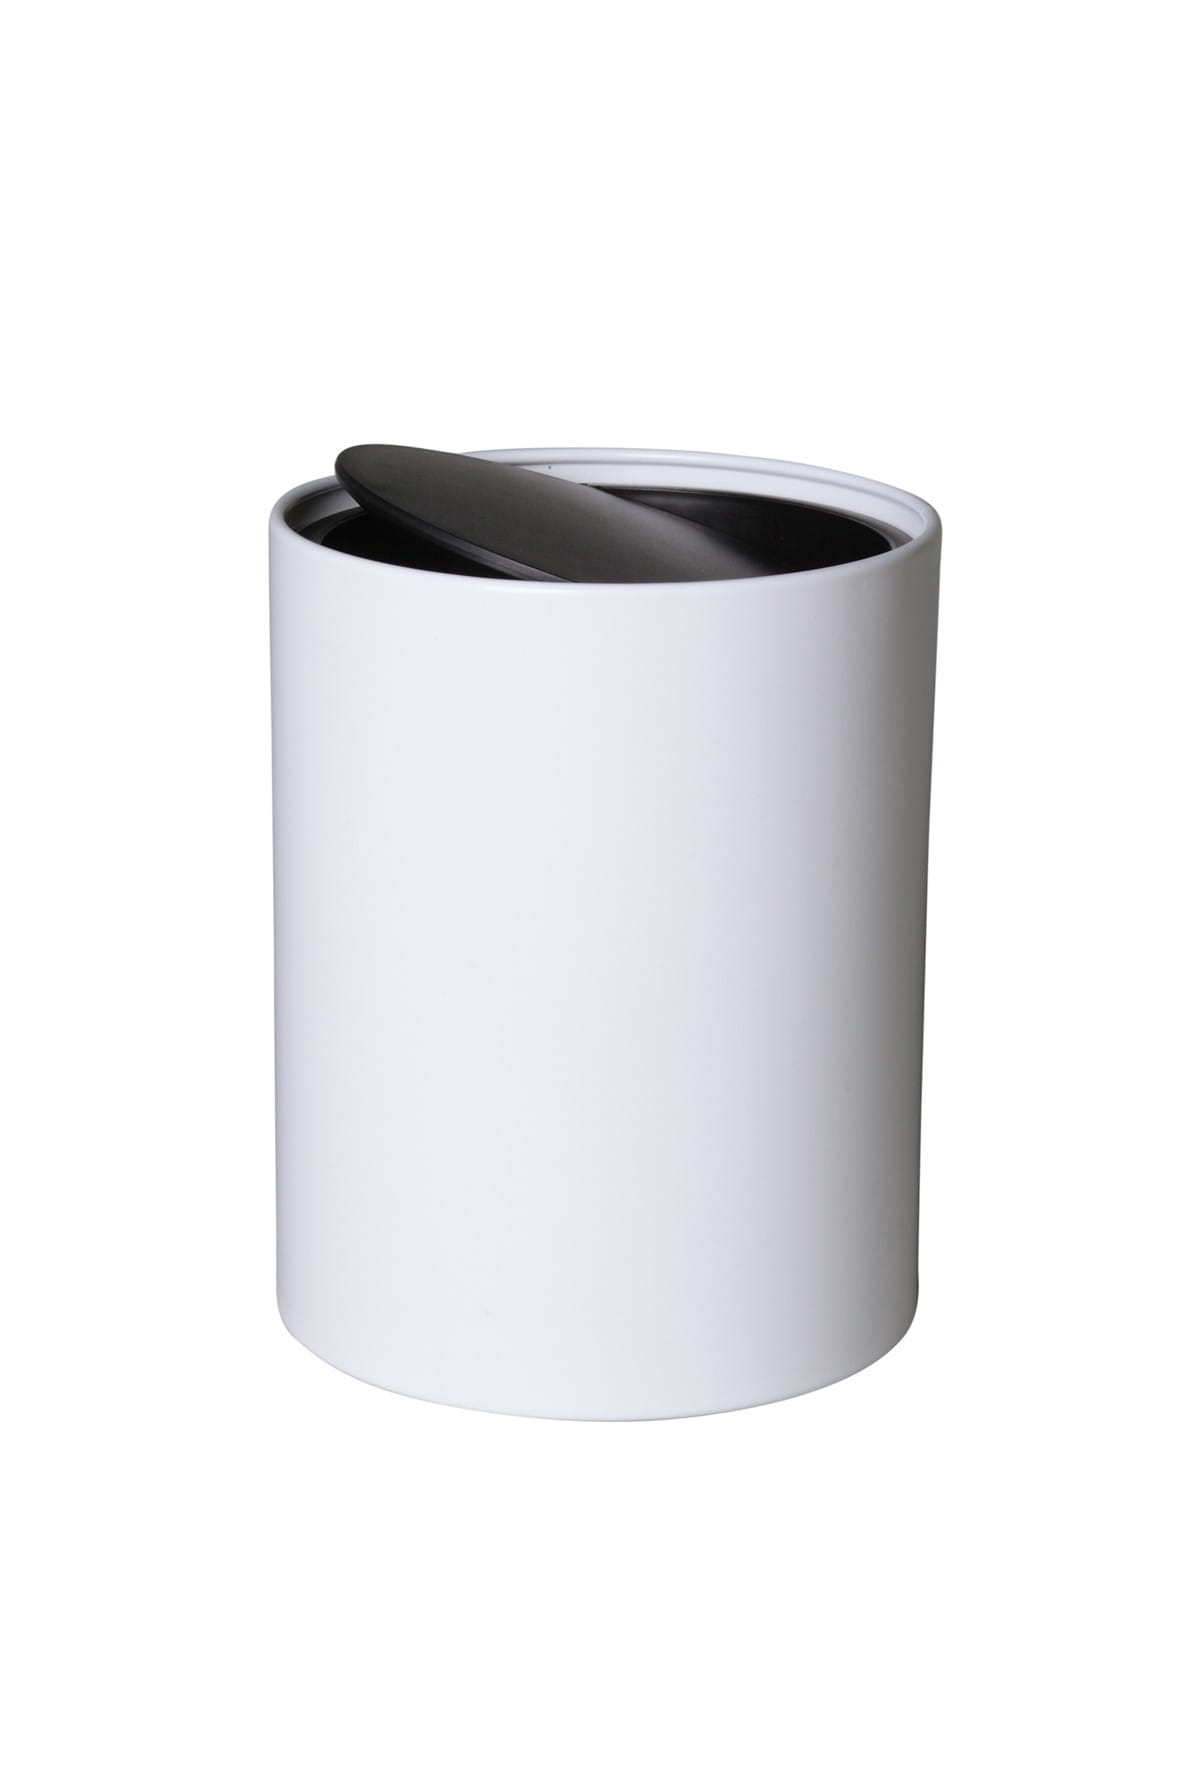 Tiger Pure wiaderko toaletowe białe 265610146